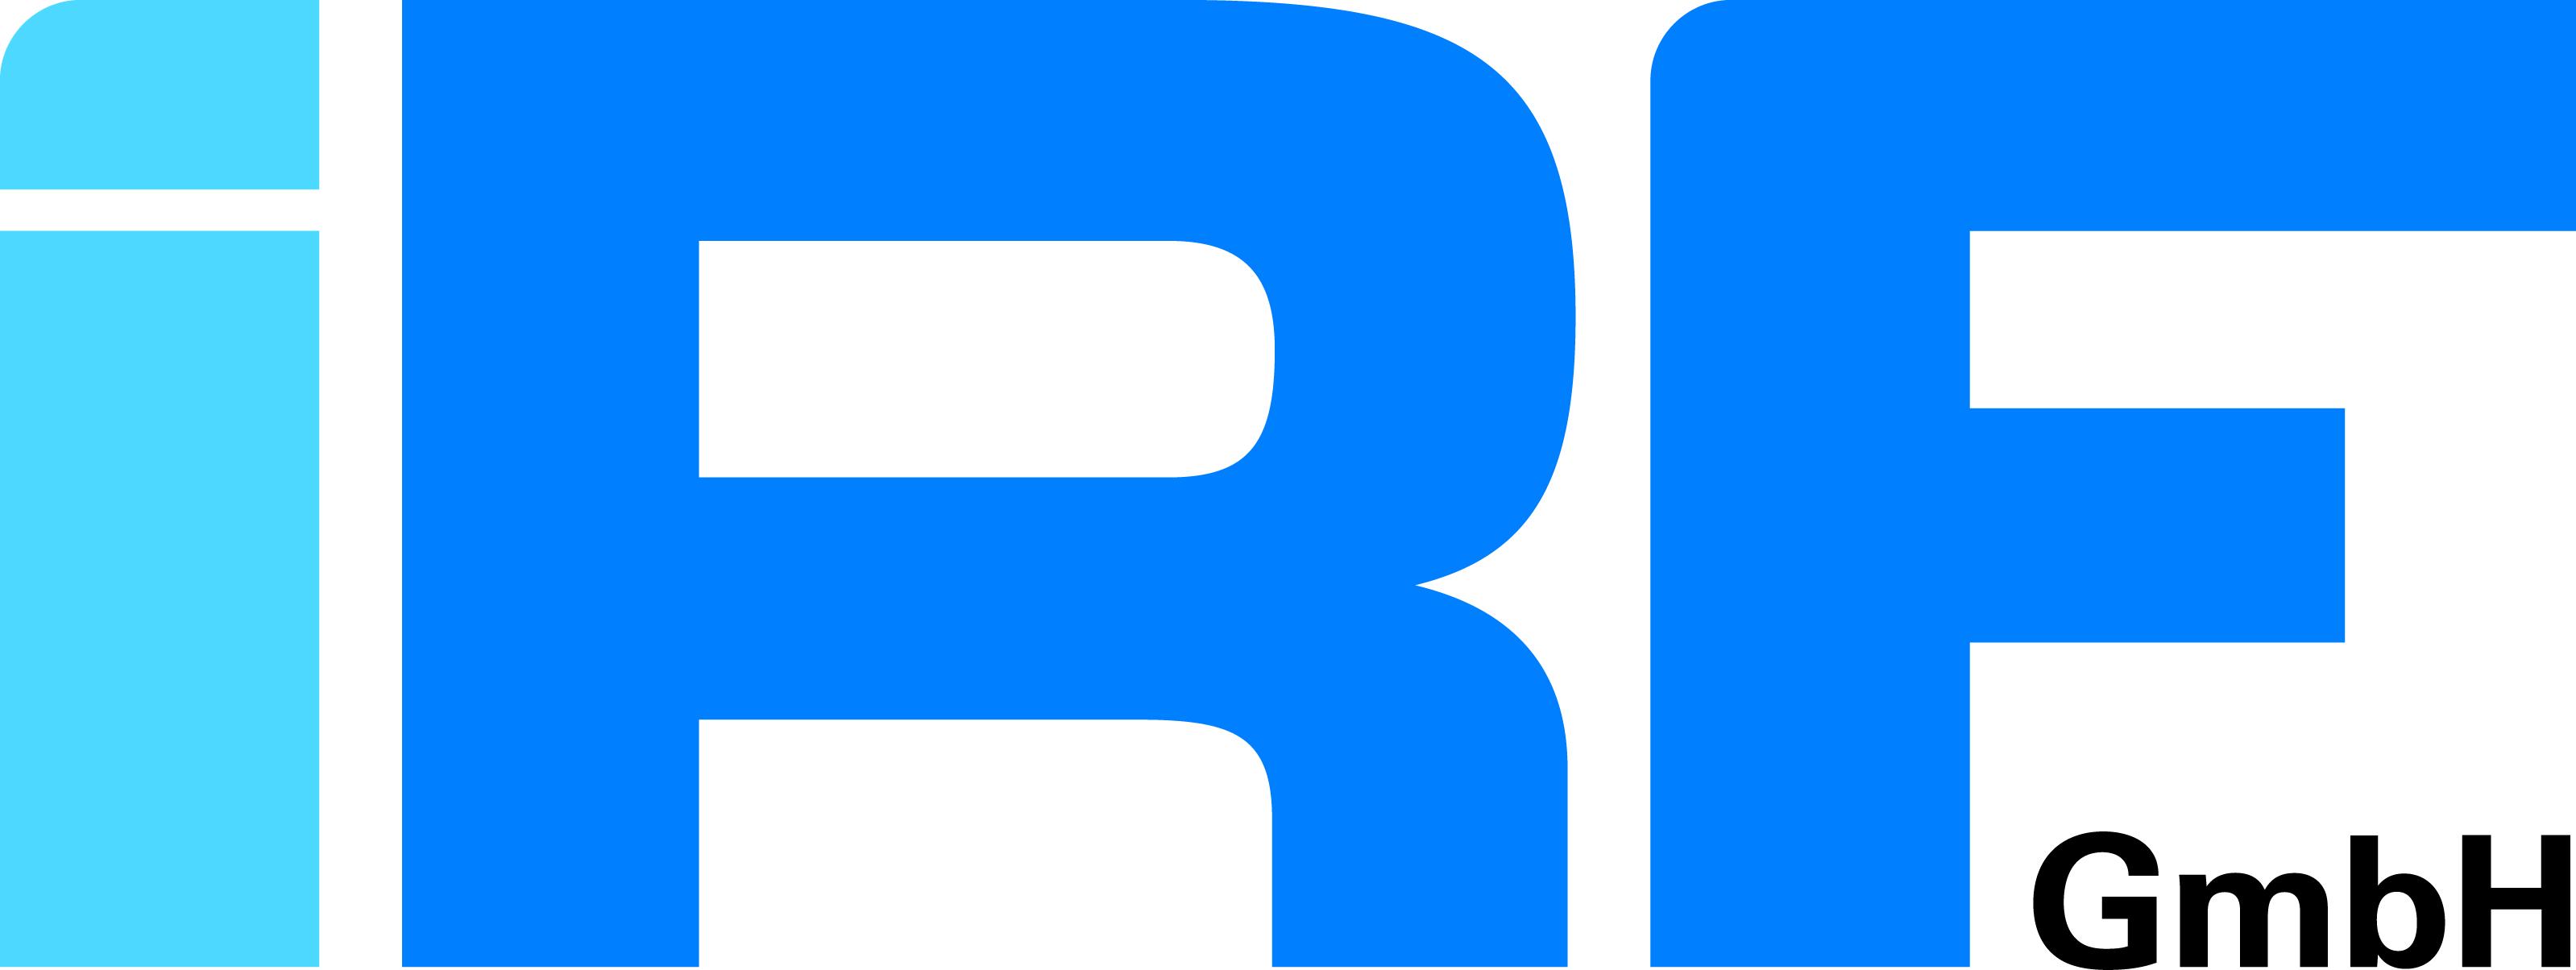 IRF GmbH